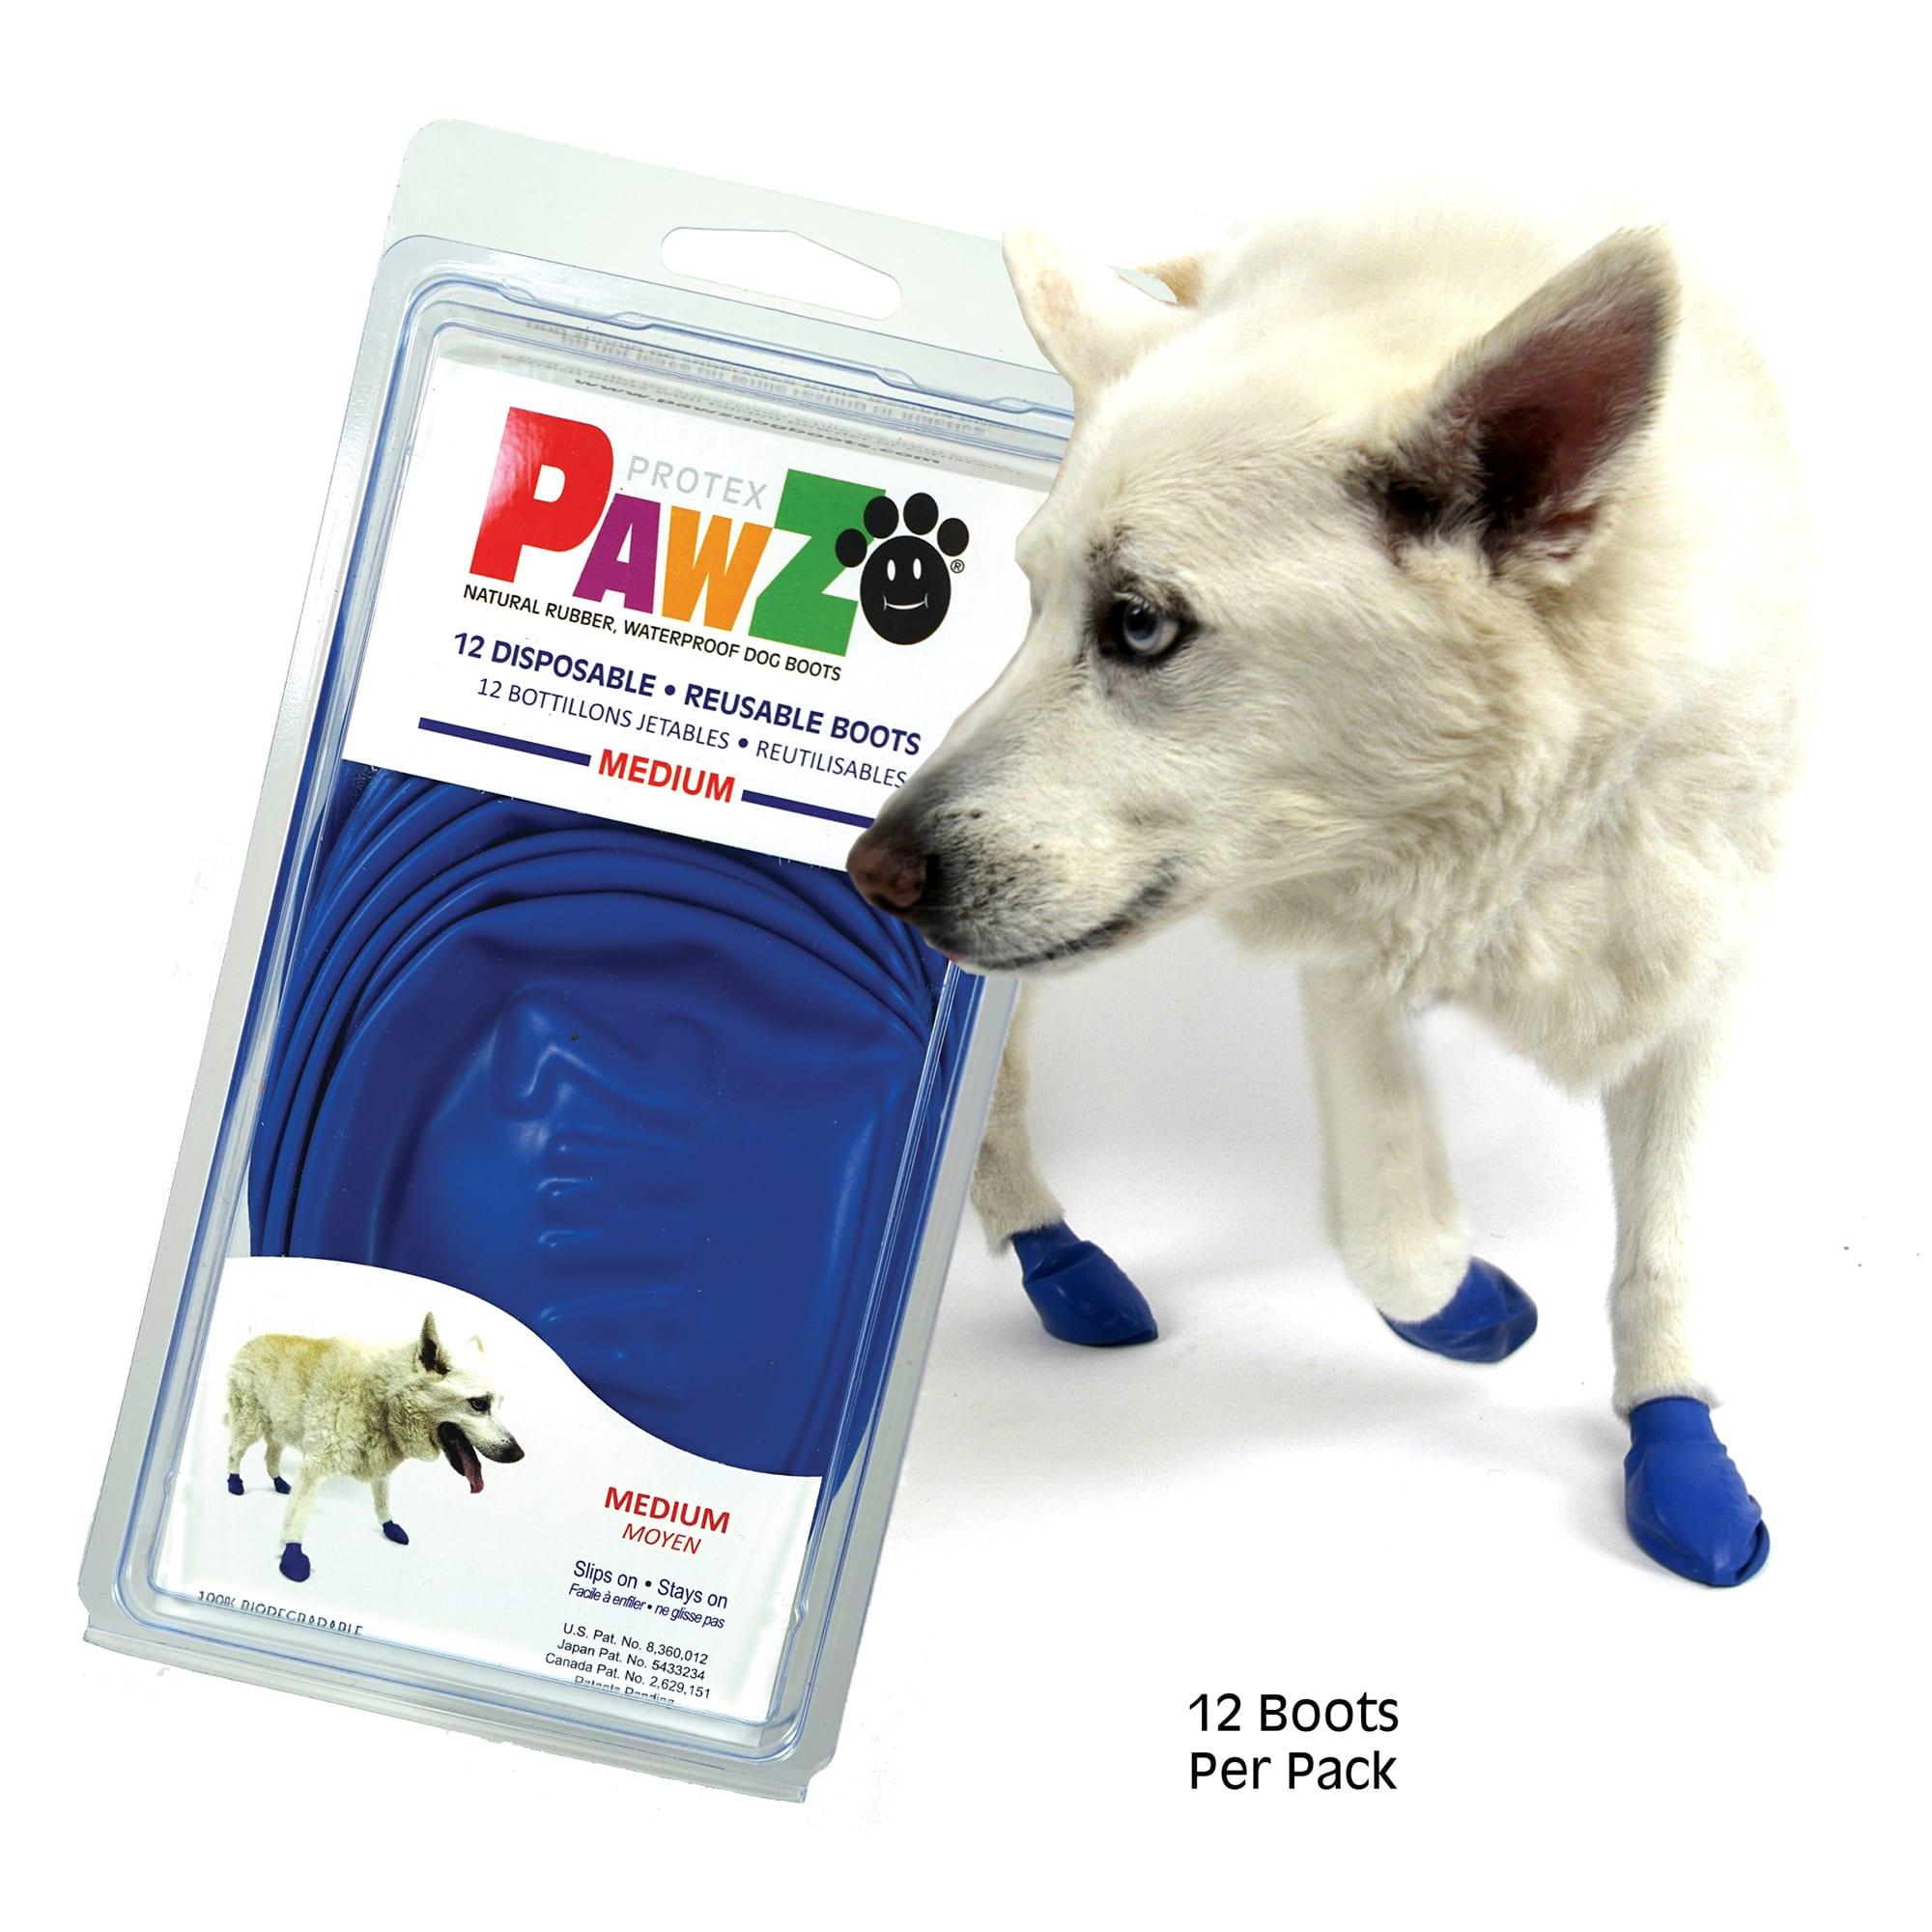 Pawz Dog Boots Waterproof